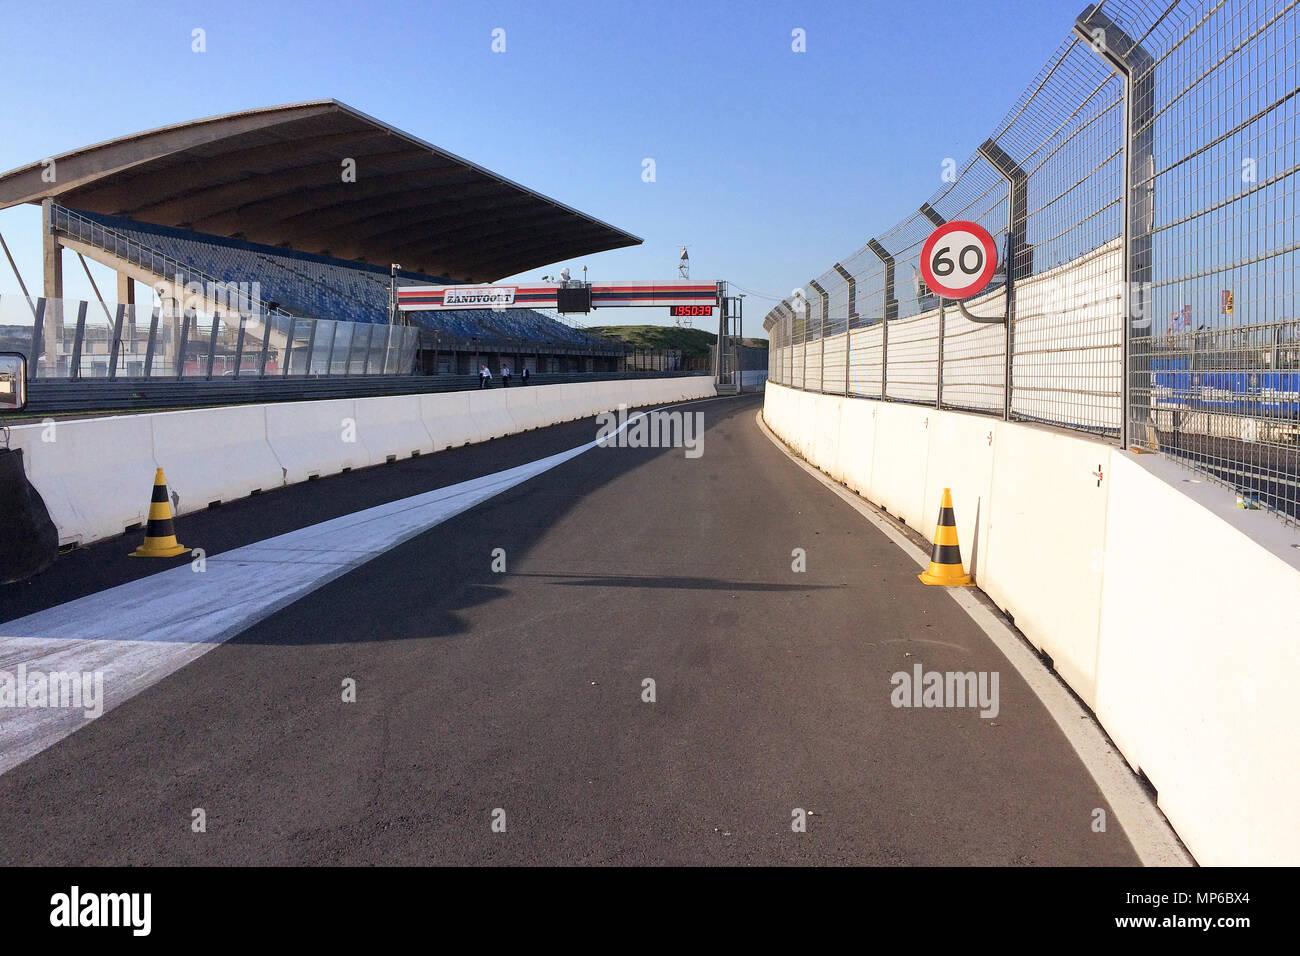 empty pit lane Circuit Zandvoort | leere Boxengasse, Rennstrecke - Stock Image